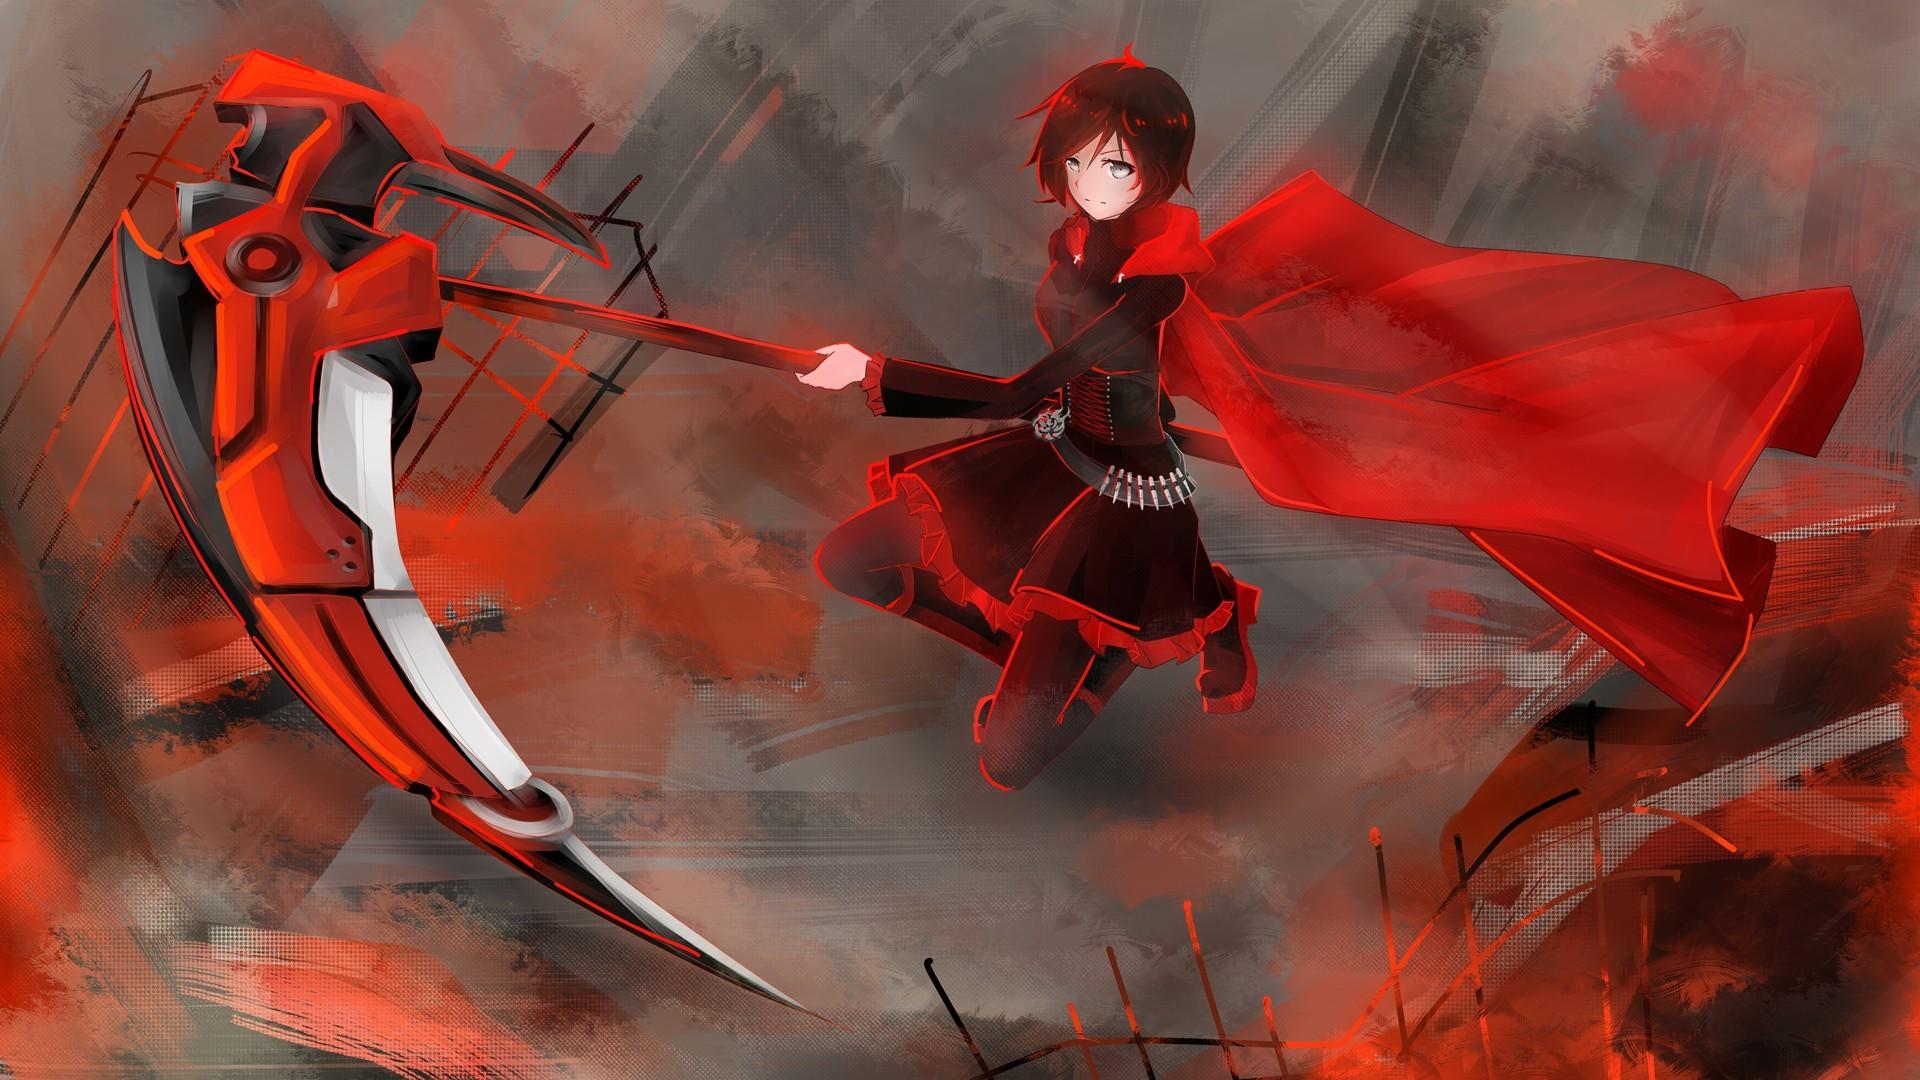 Illustration Anime Girls Red Weapon RWBY Scythe Ruby Rose Character Screenshot Mecha Computer Wallpaper